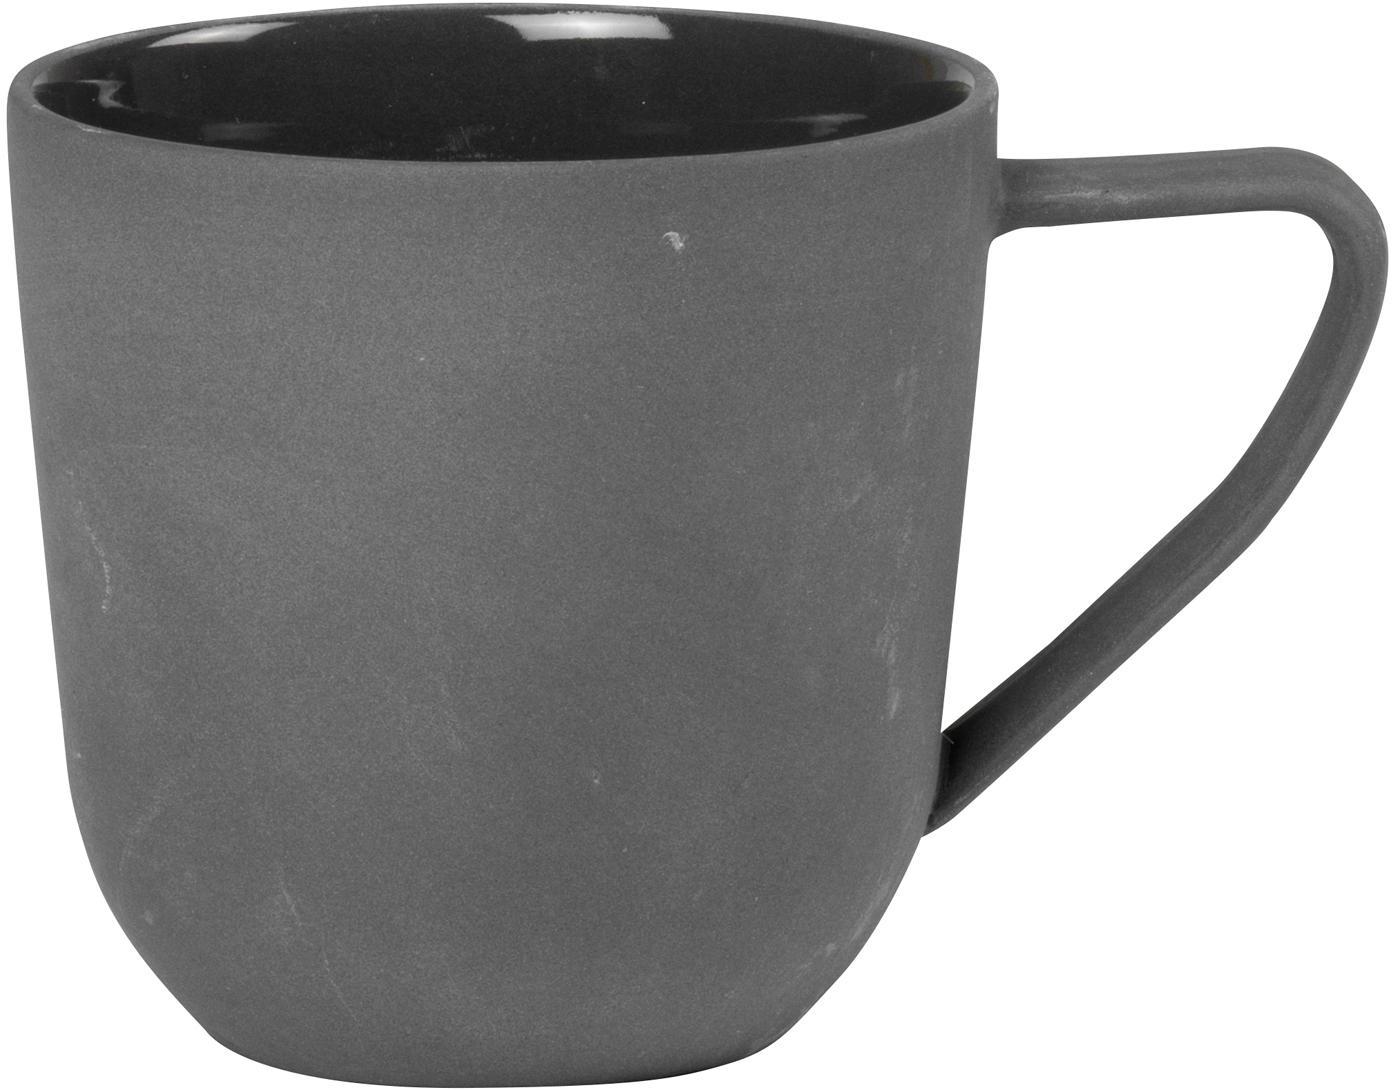 Tazas Nudge, 4uds., Porcelana, Gris oscuro, Ø 8 x Al 8 cm